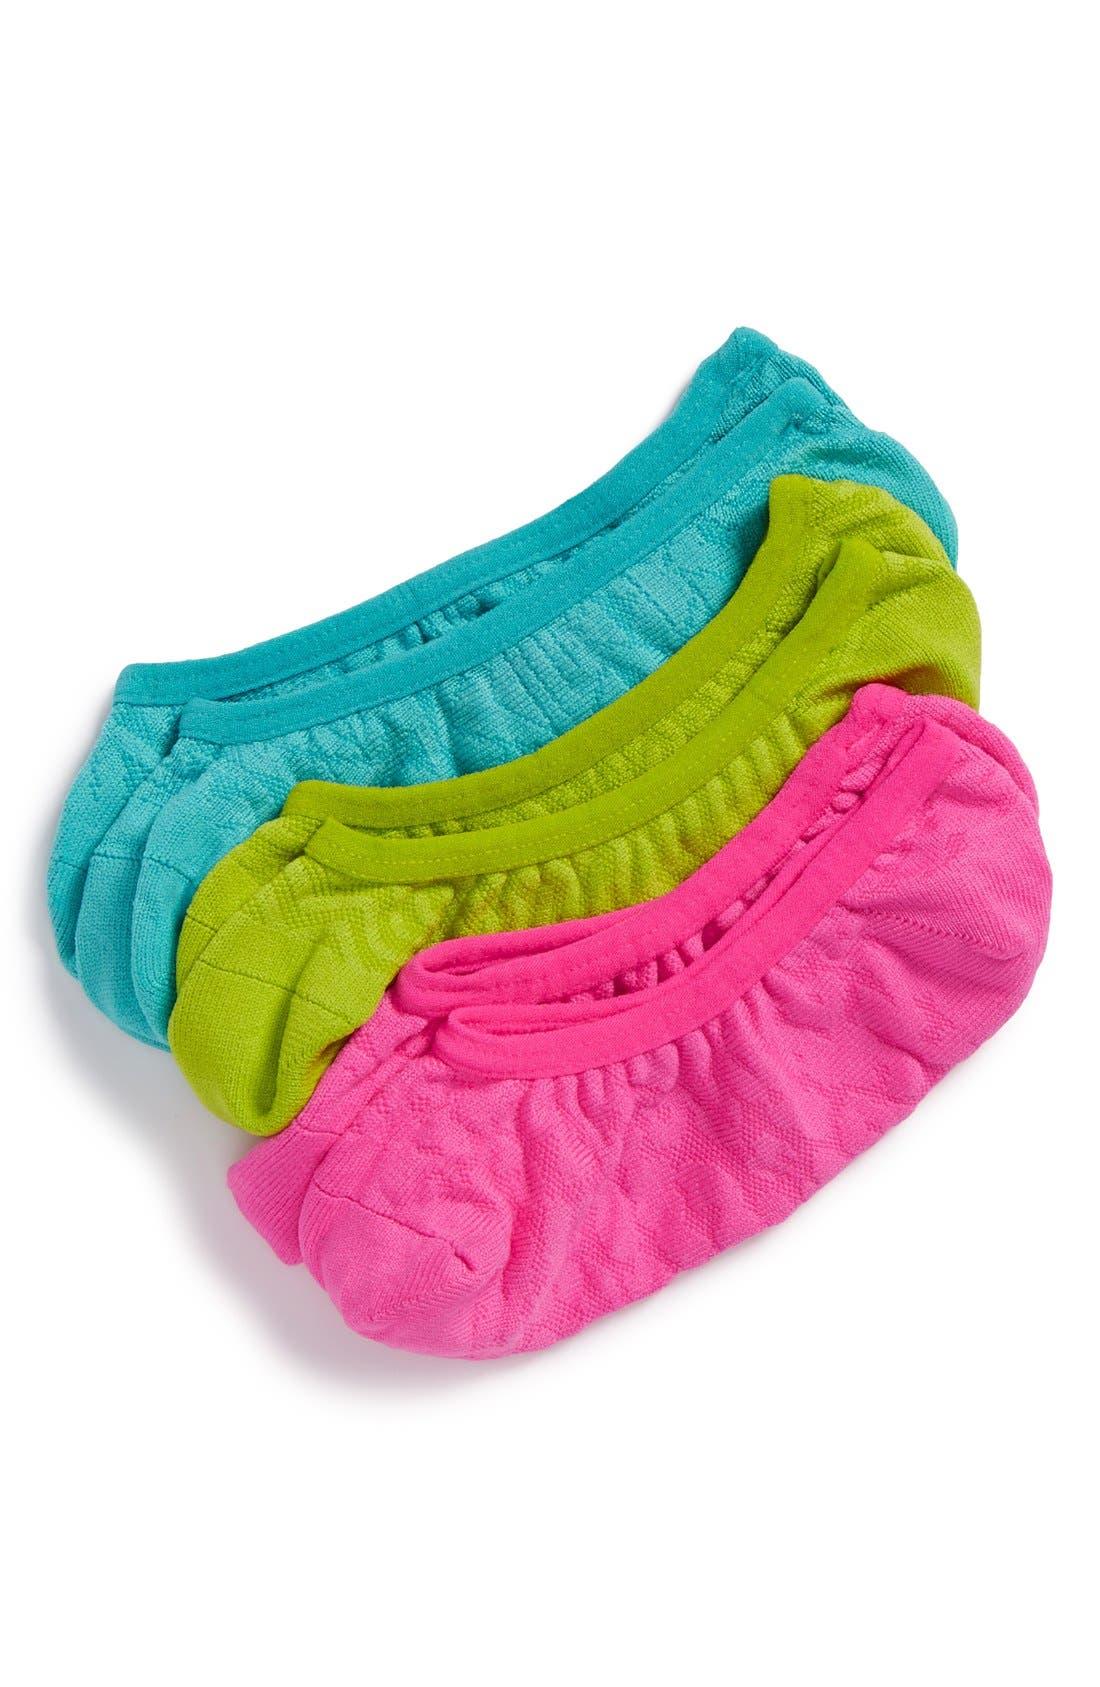 3-Pack Microfiber Tab Performance Socks,                             Main thumbnail 5, color,